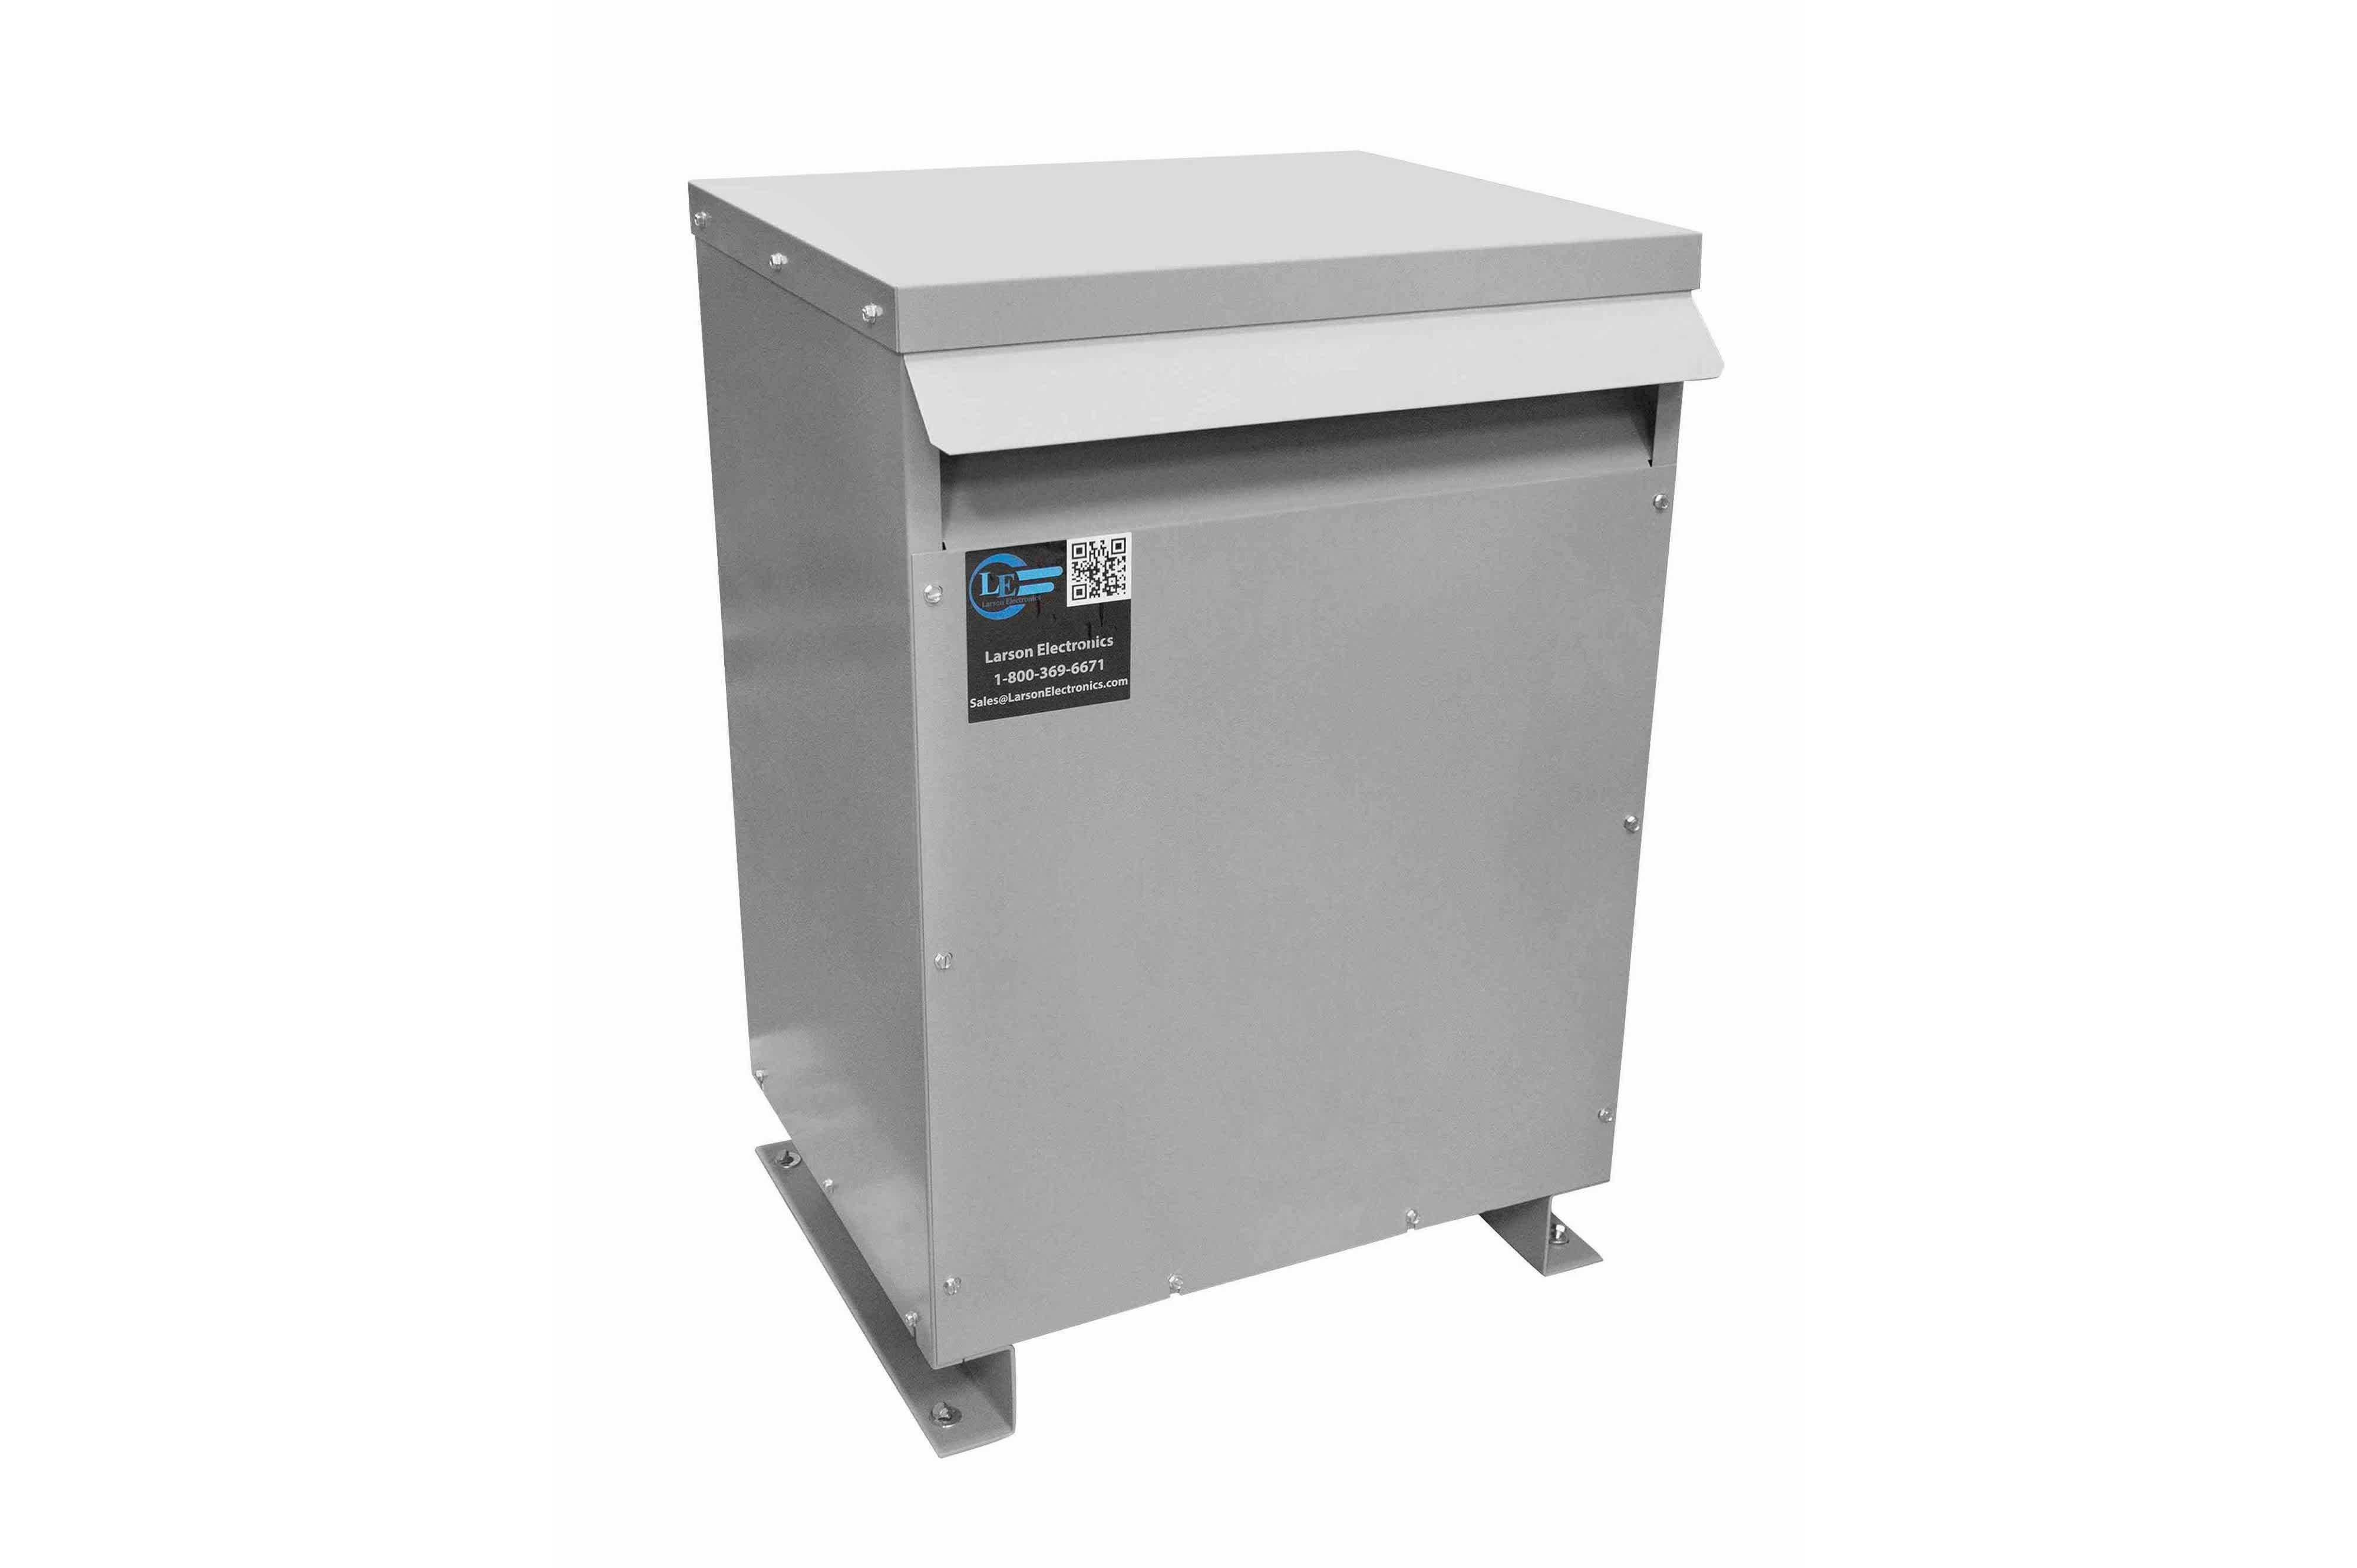 1000 kVA 3PH Isolation Transformer, 208V Wye Primary, 400Y/231 Wye-N Secondary, N3R, Ventilated, 60 Hz